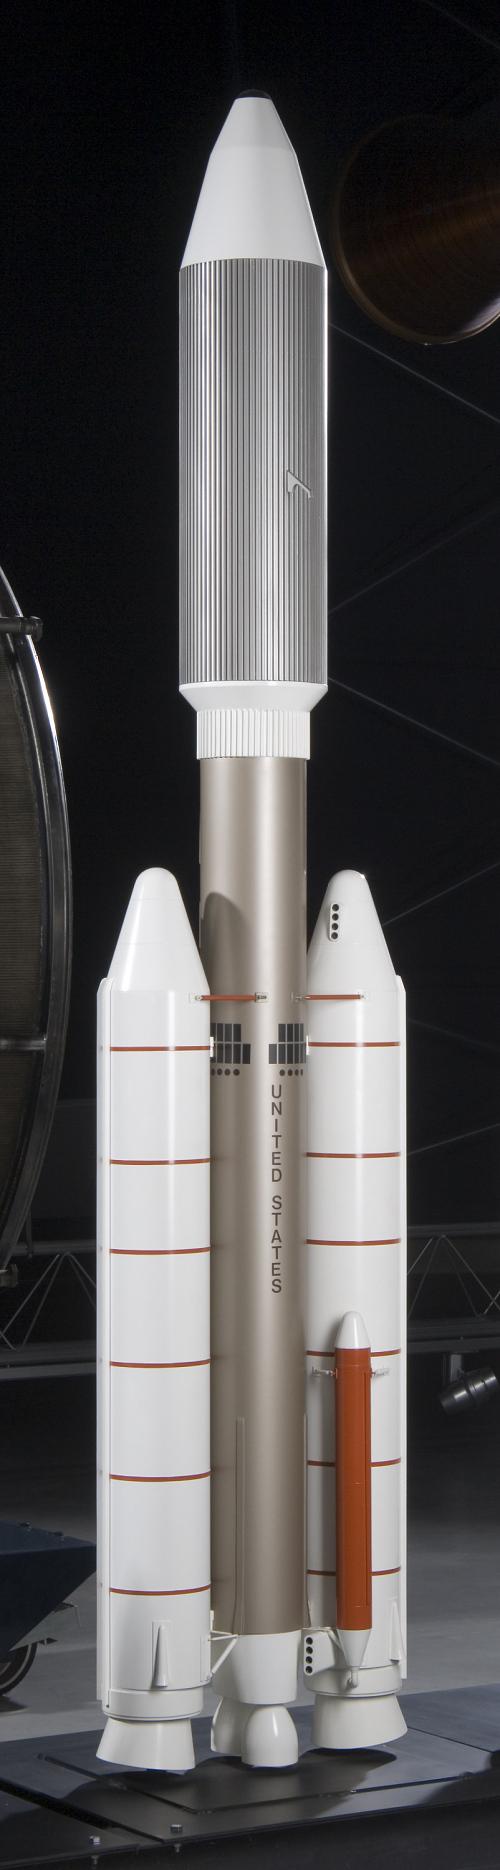 Model, Rocket, Titan IIIE Centaur, 1:15